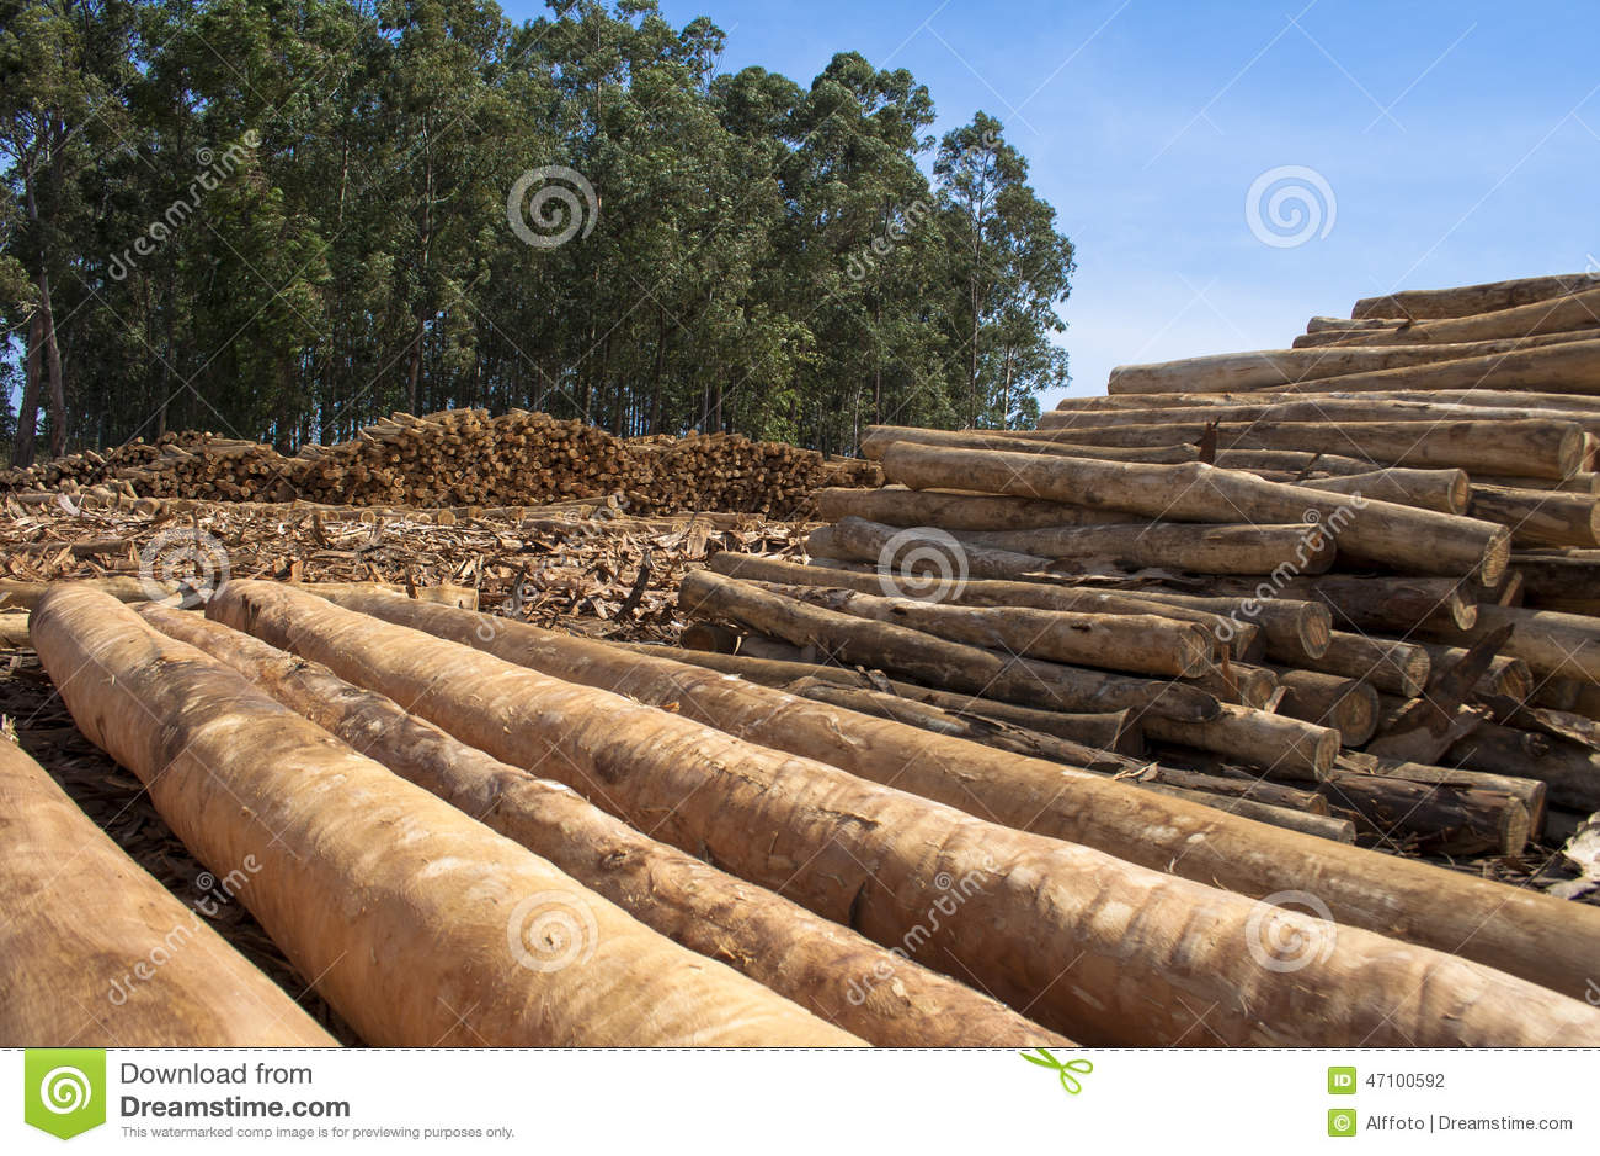 Eucalyptus Tree Stock Photo Image Of Logs Construction 47100592